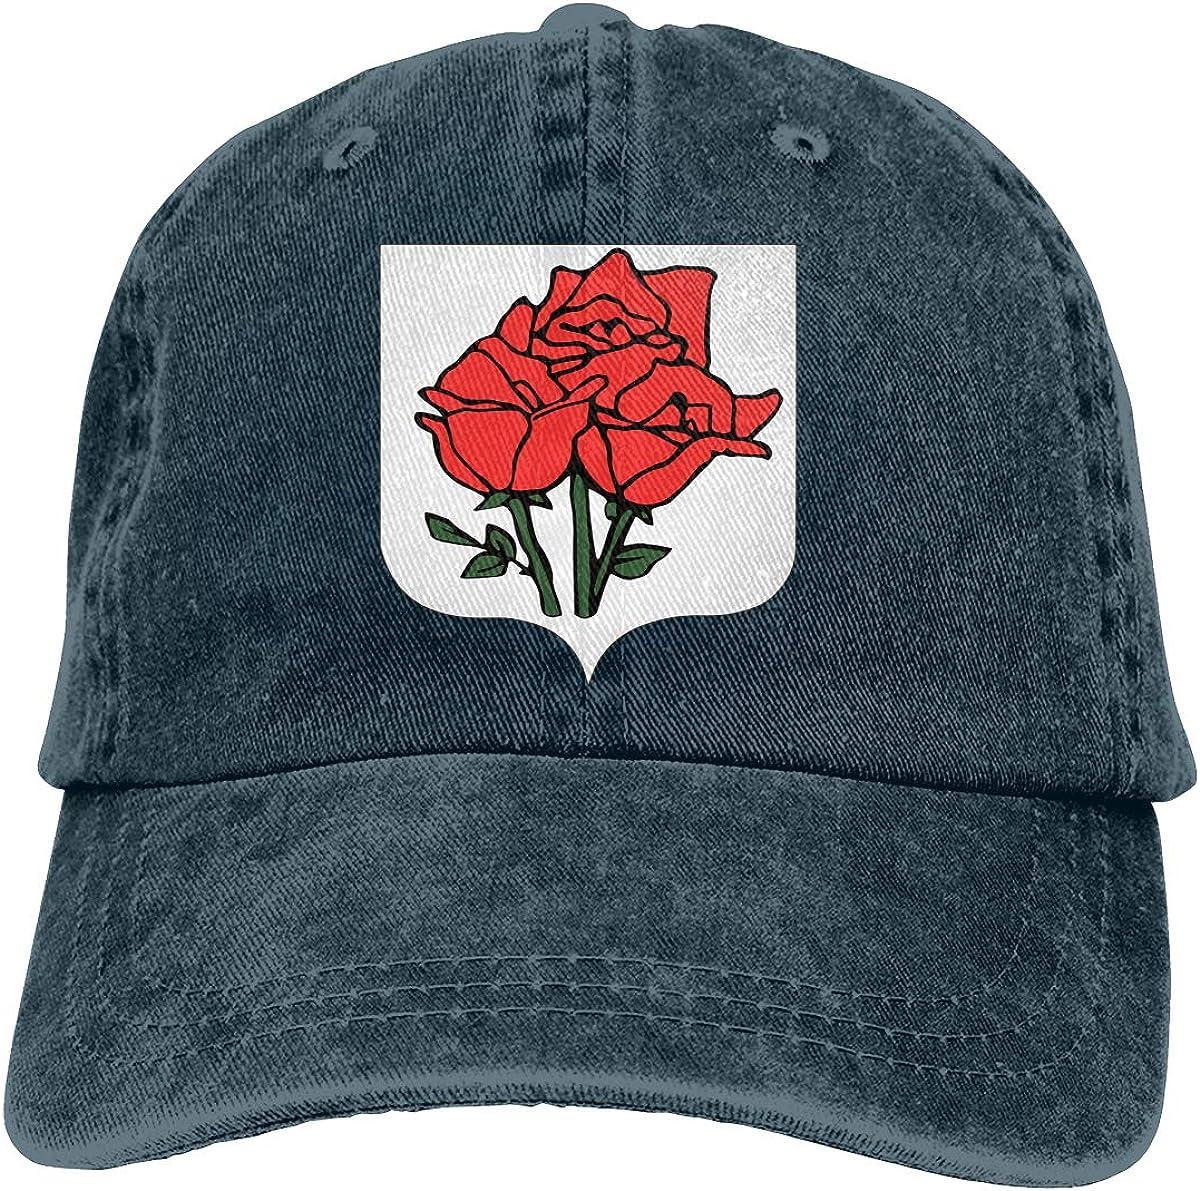 Rose Island Flag Unisex Custom Cowboy Hat Casquette Adjustable Baseball Cap